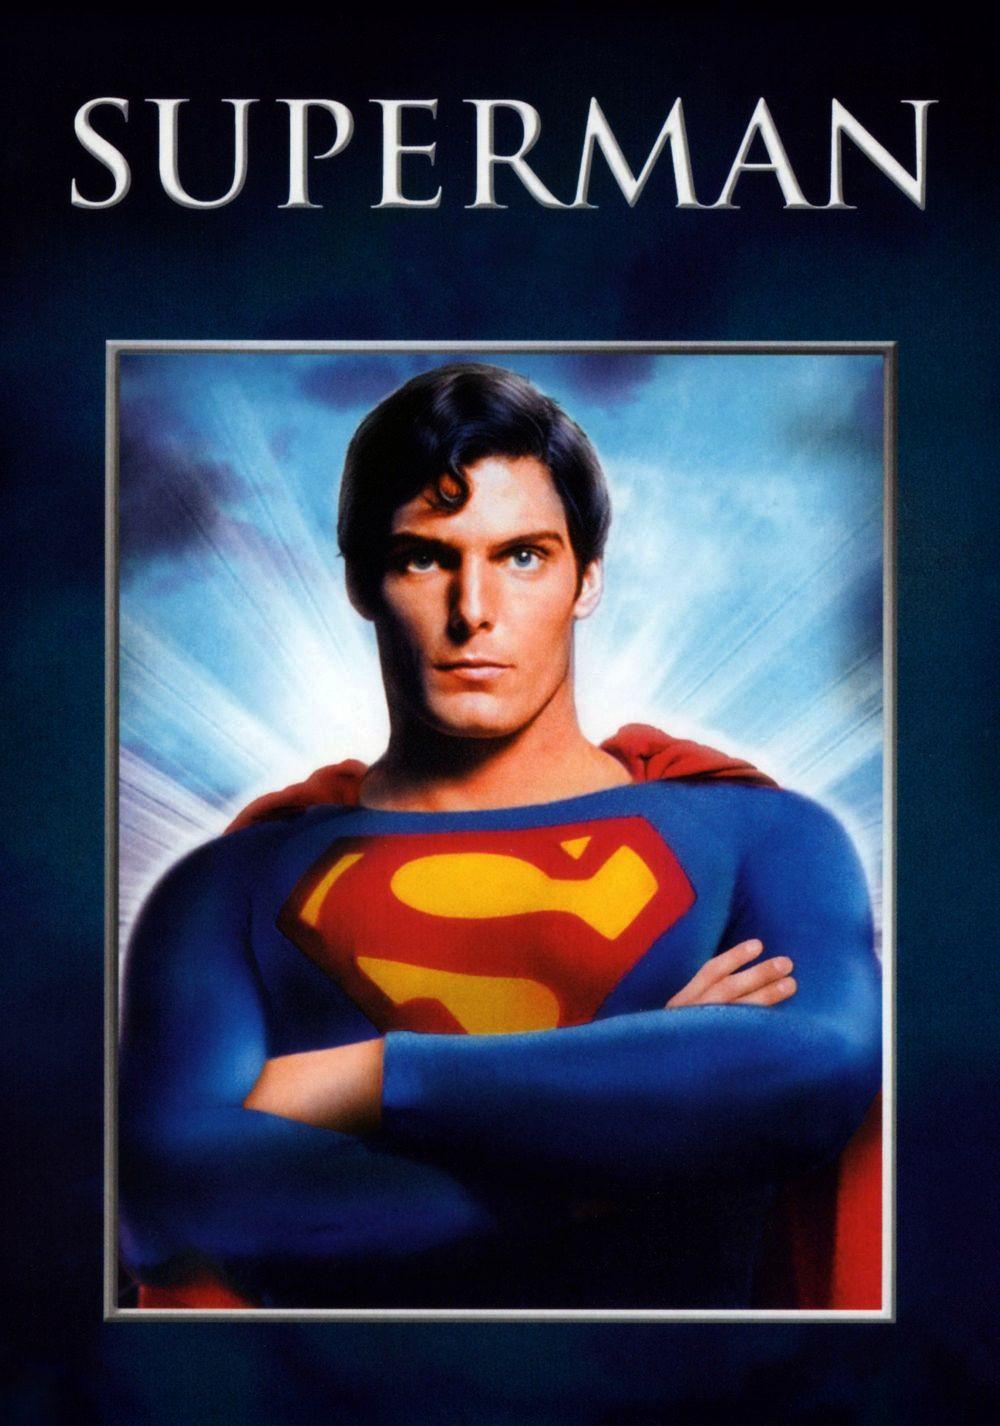 superman filme stream